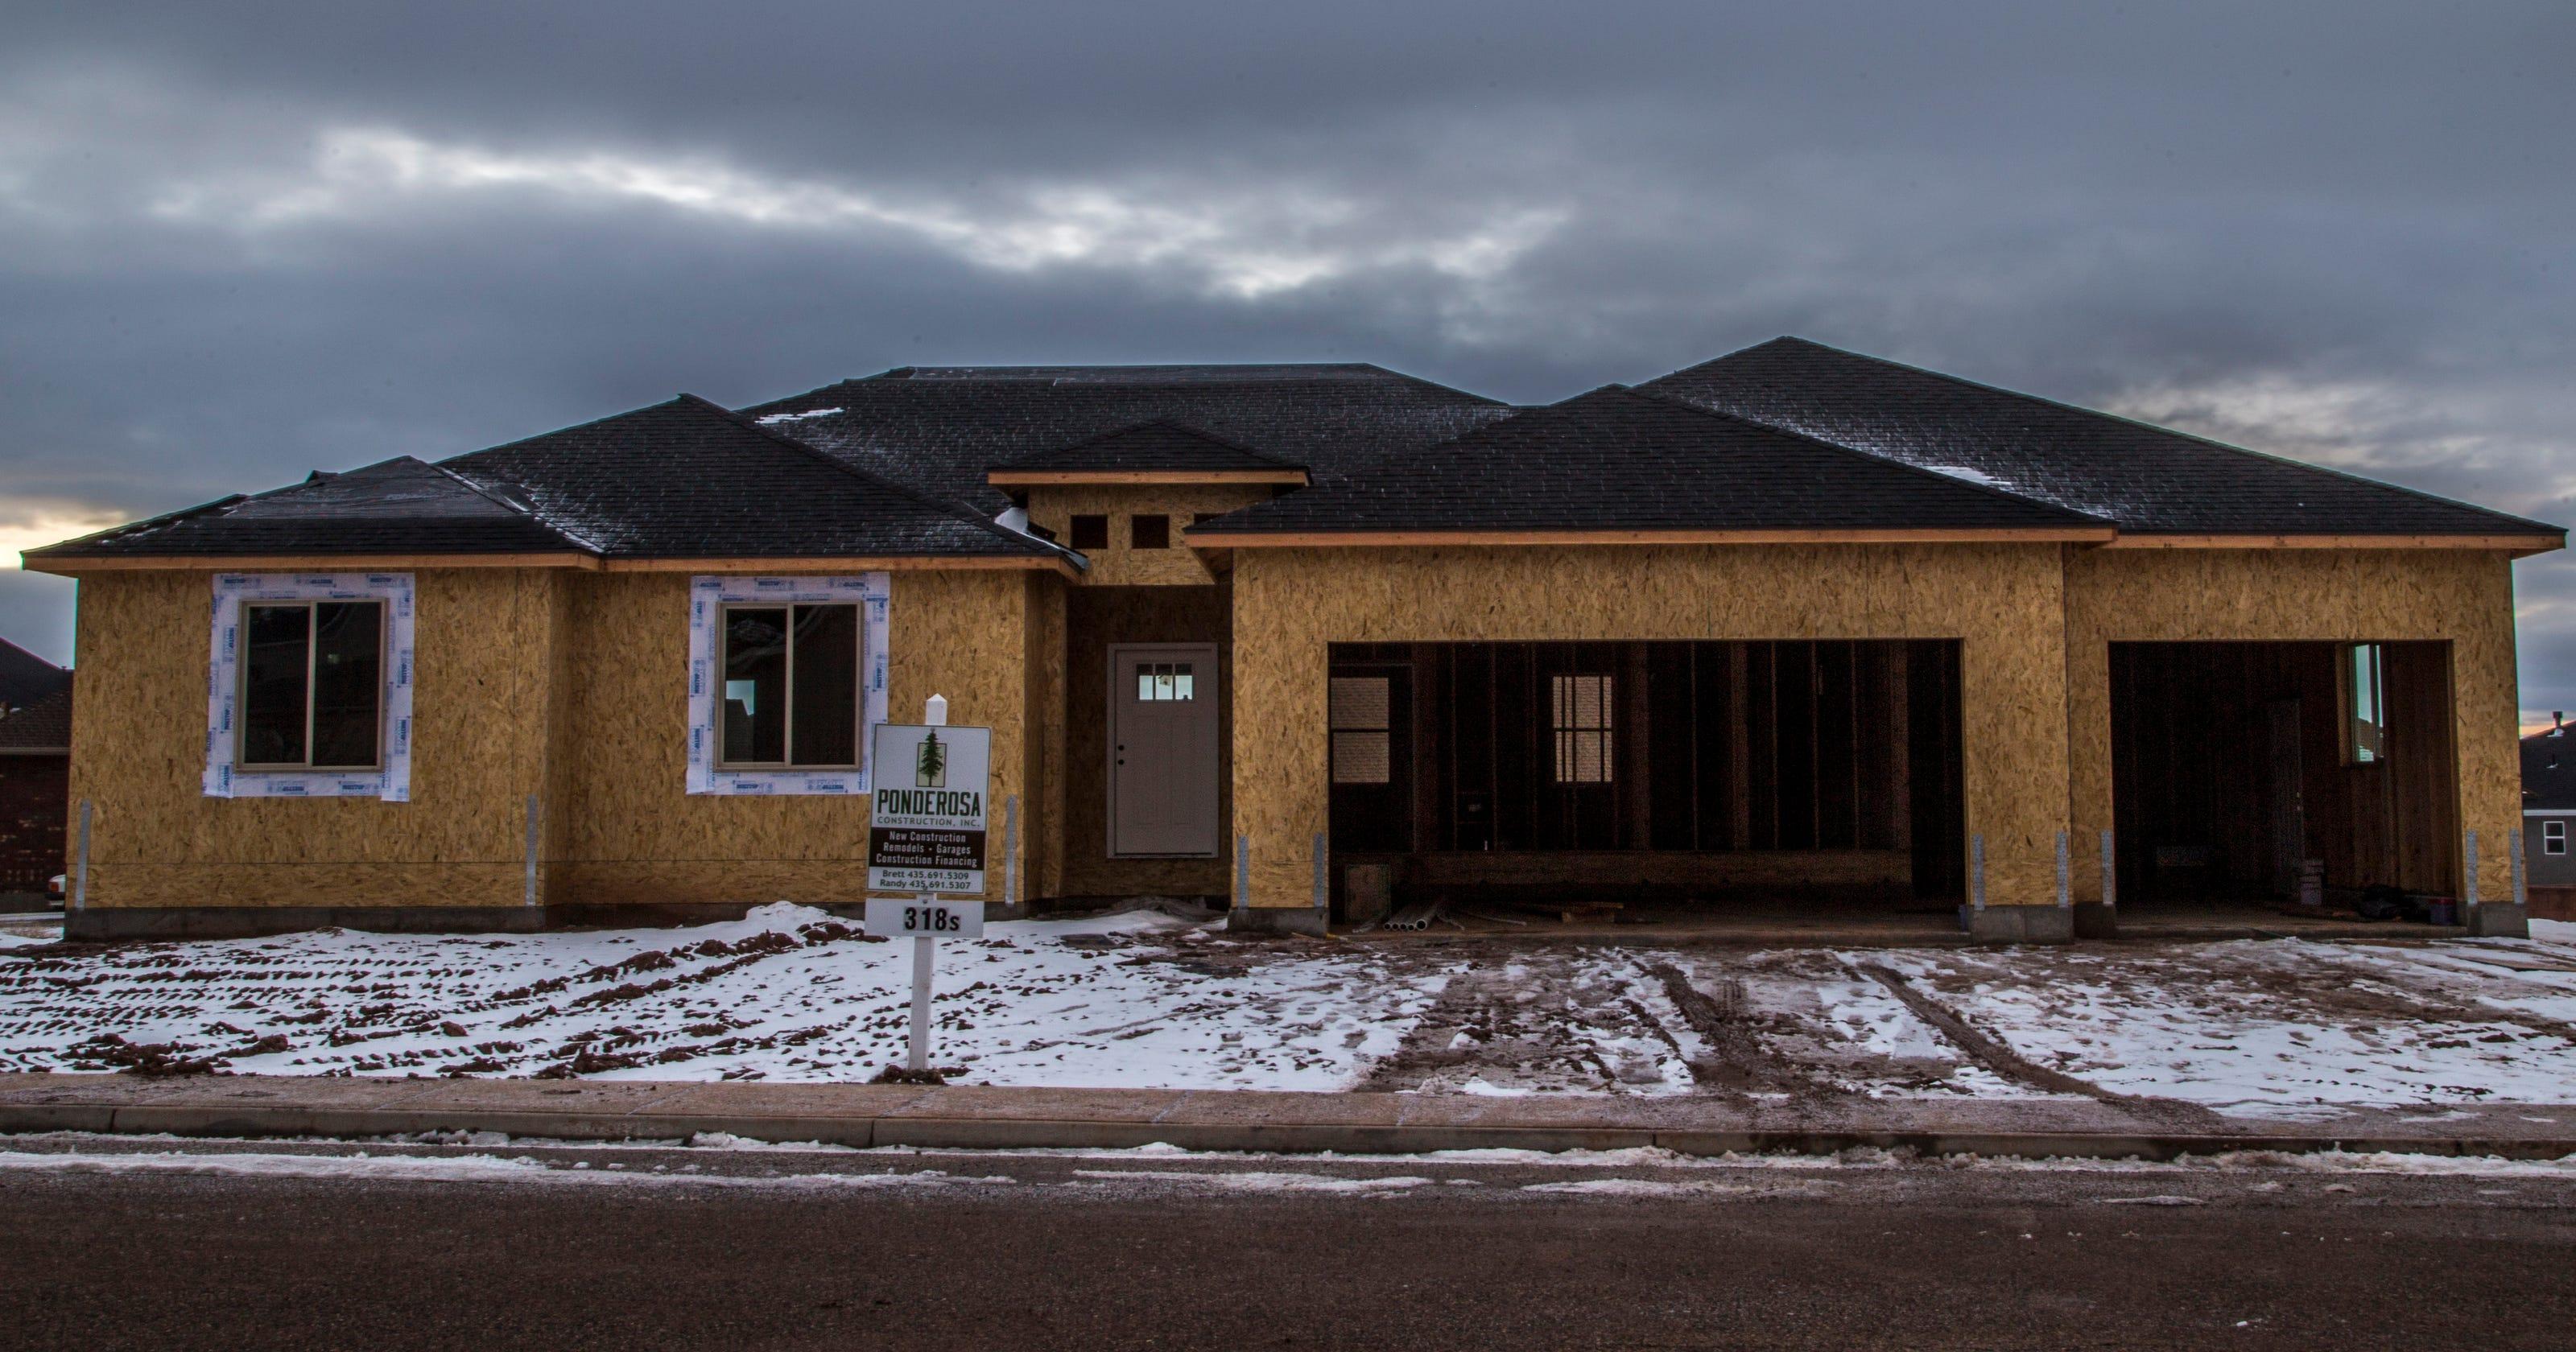 Real estate prices rising around Cedar City LDS Temple